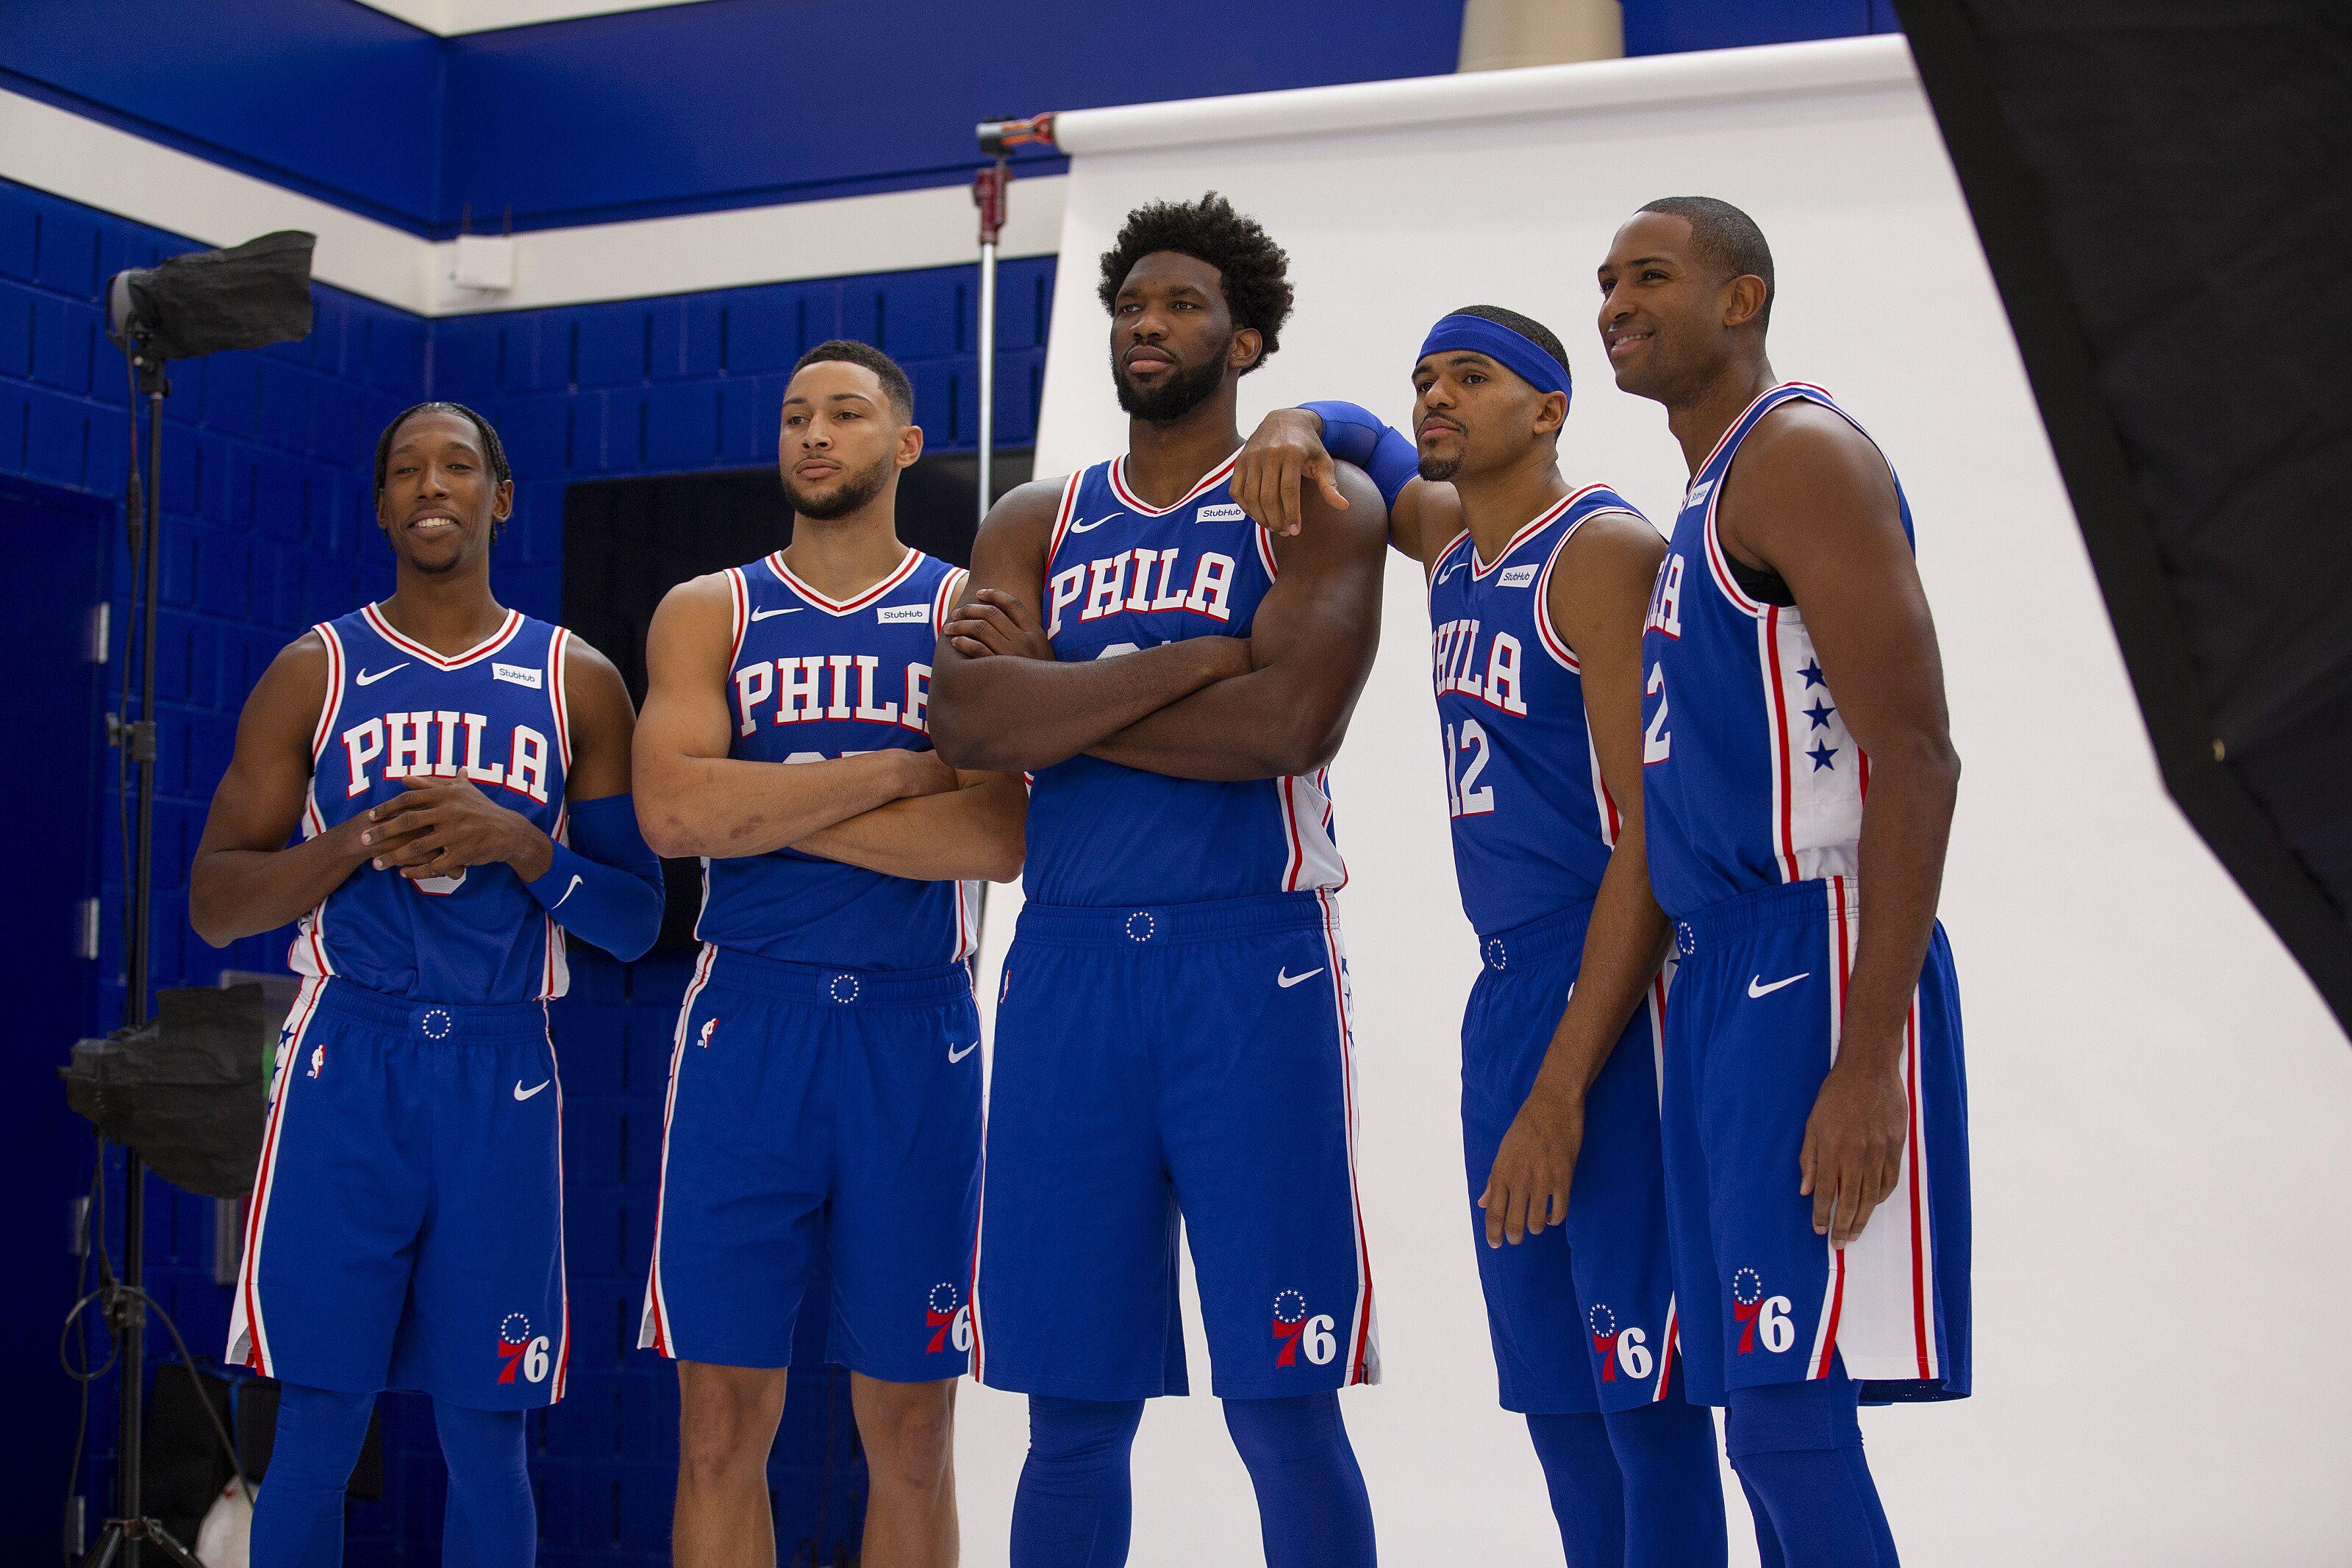 Predictions for a big Philadelphia 76ers 2019-20 season